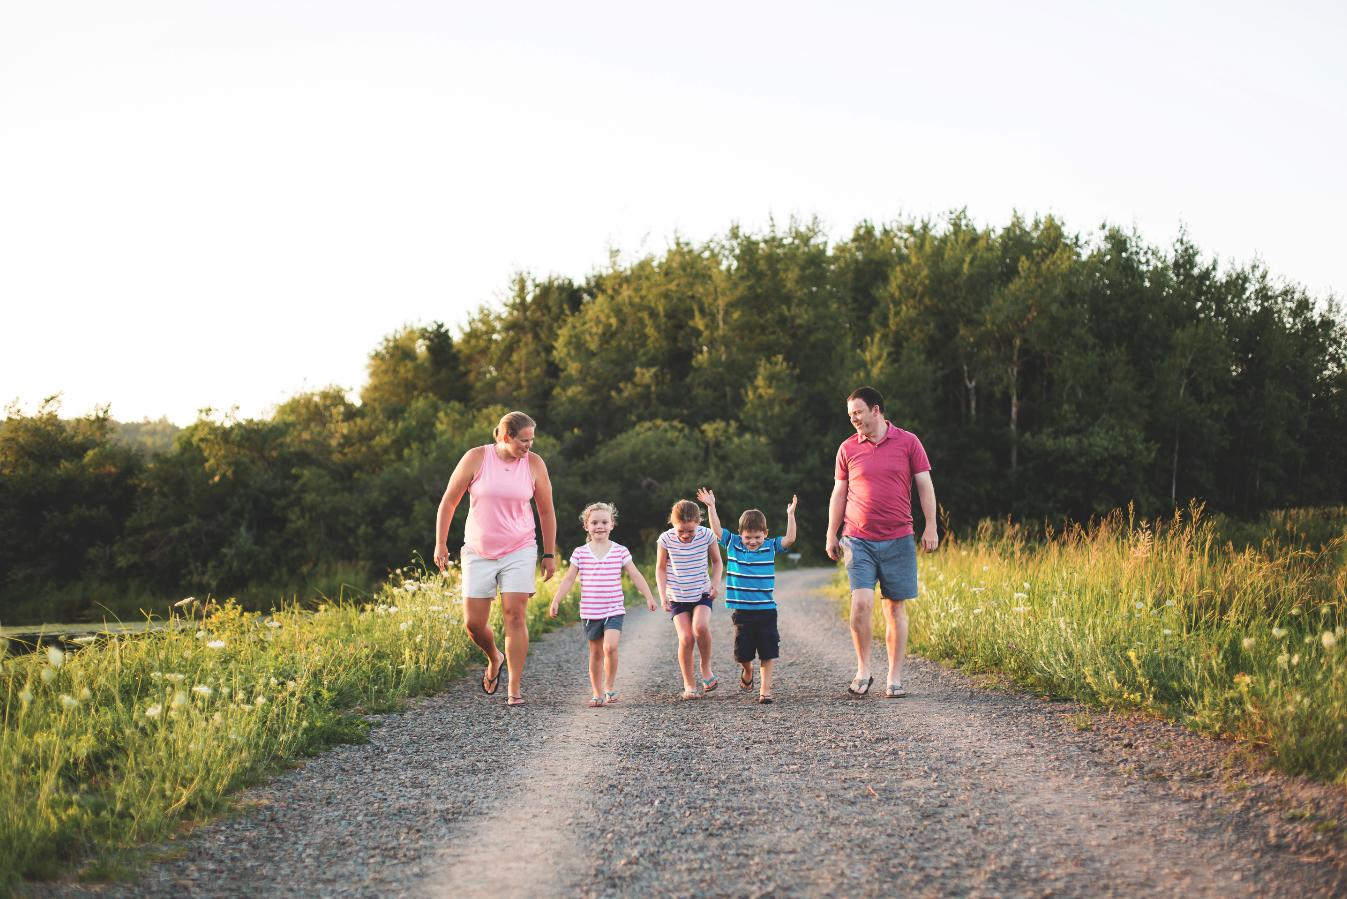 Hamilton-Toronto-Burlington-Oakville-welland-Niagara-Cambridge-Dundas-Ontario-Family-photographer-photography-Moments-by-Lauren-Nova-Scotia-Antigonish-Lifestyle-Session-Image-Photo-1.png